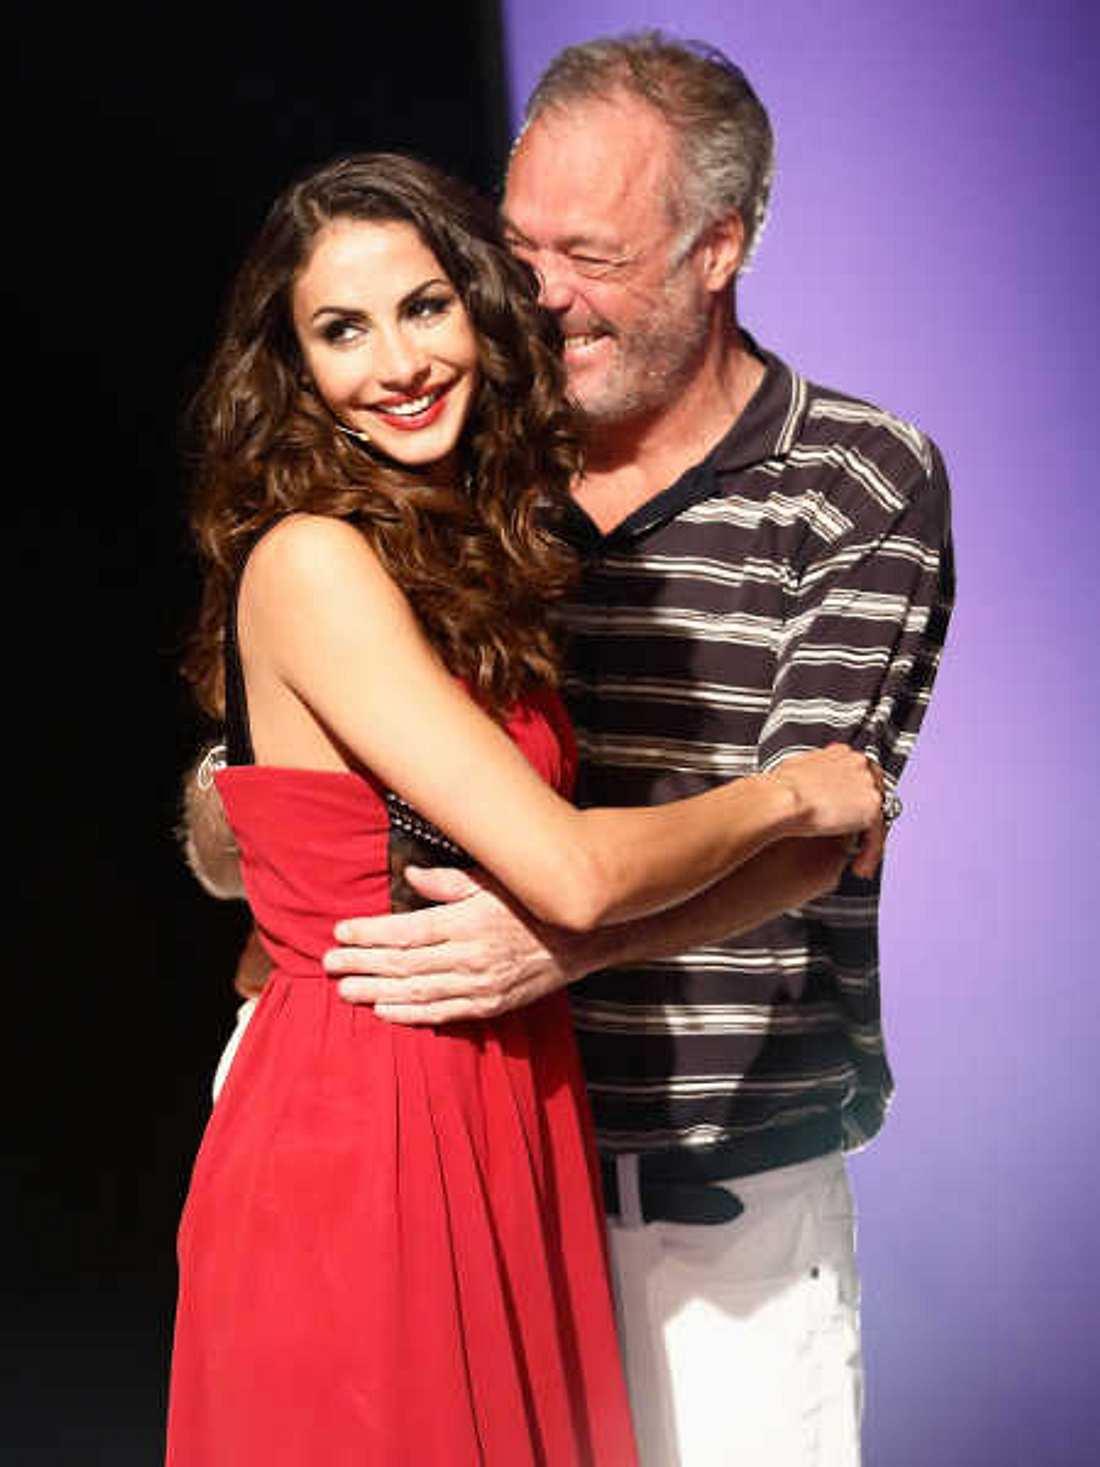 Teppichluder Janina Youssefian turtelt mit Ronald Schill in Rio!